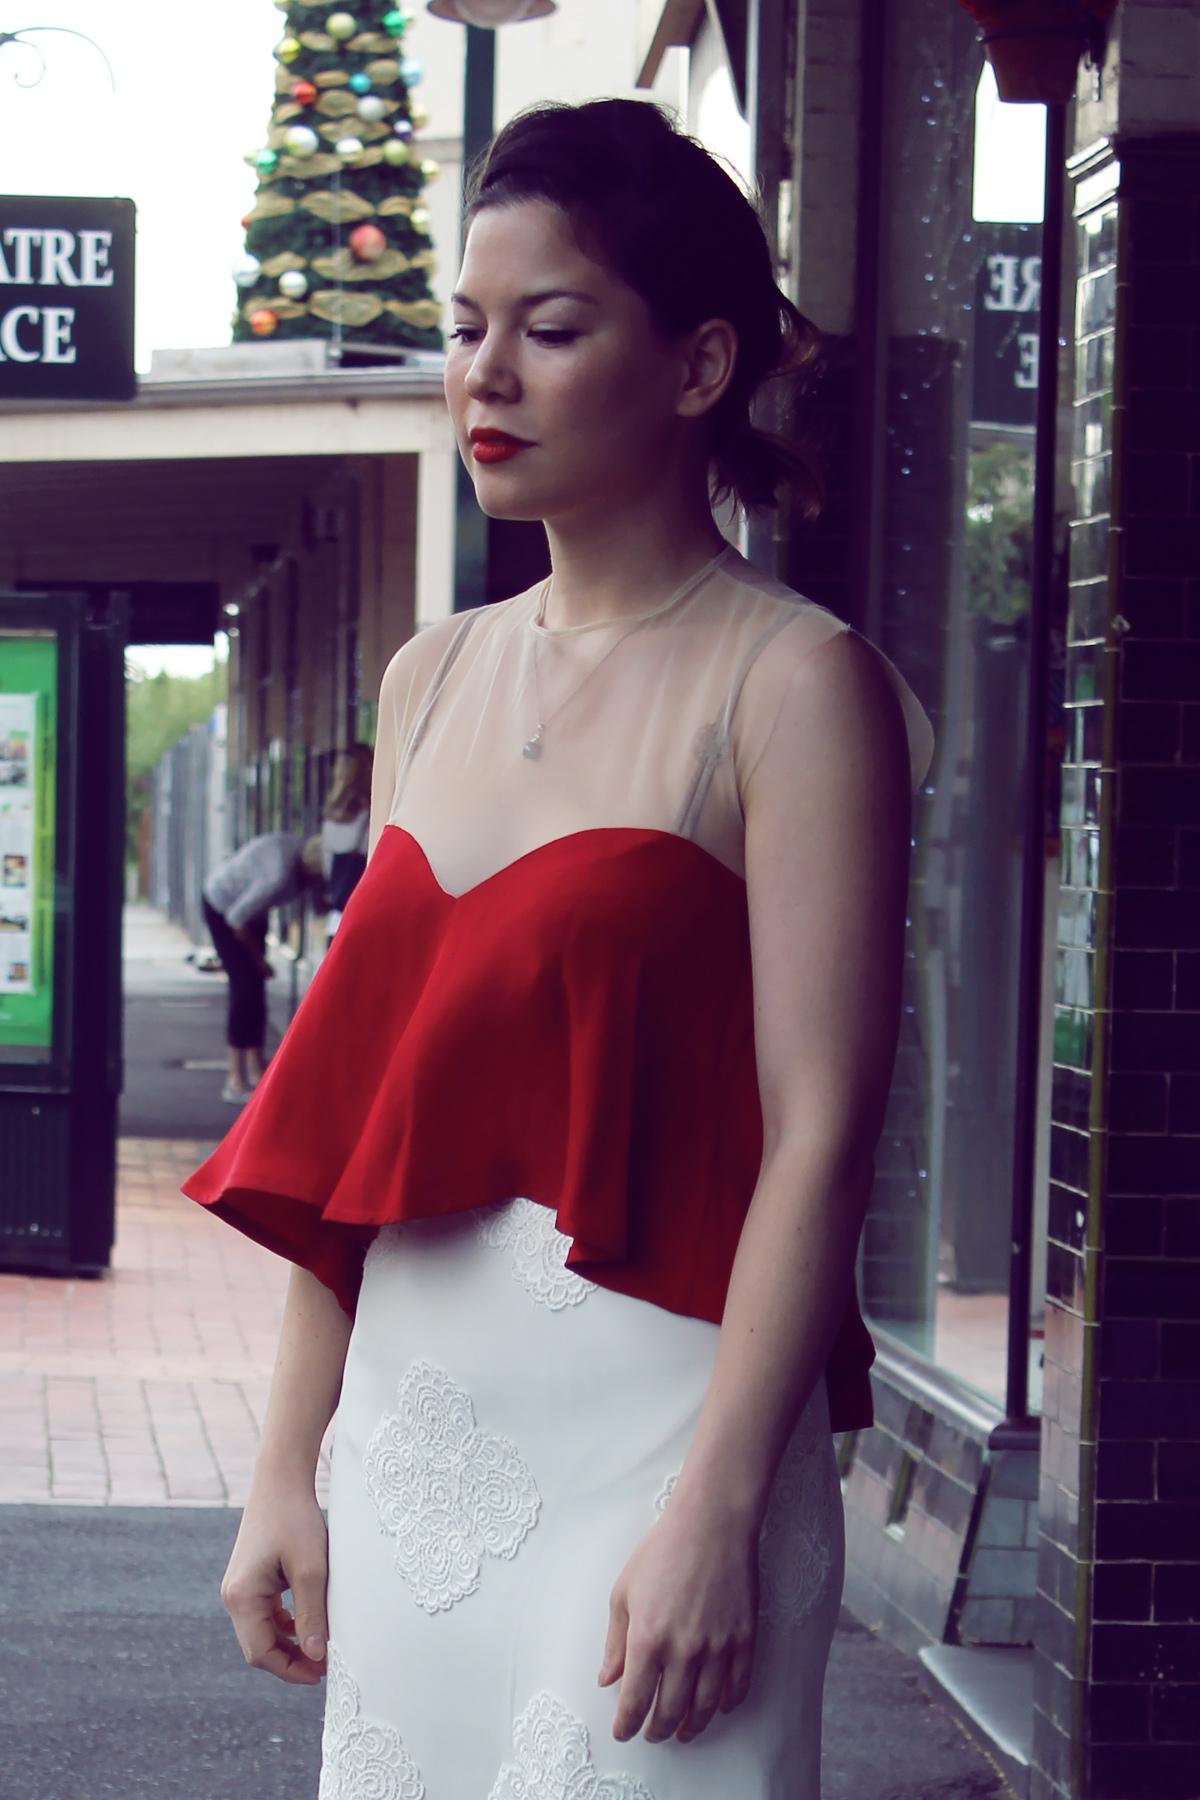 Sweetheart Top & Falling Rose Skirt